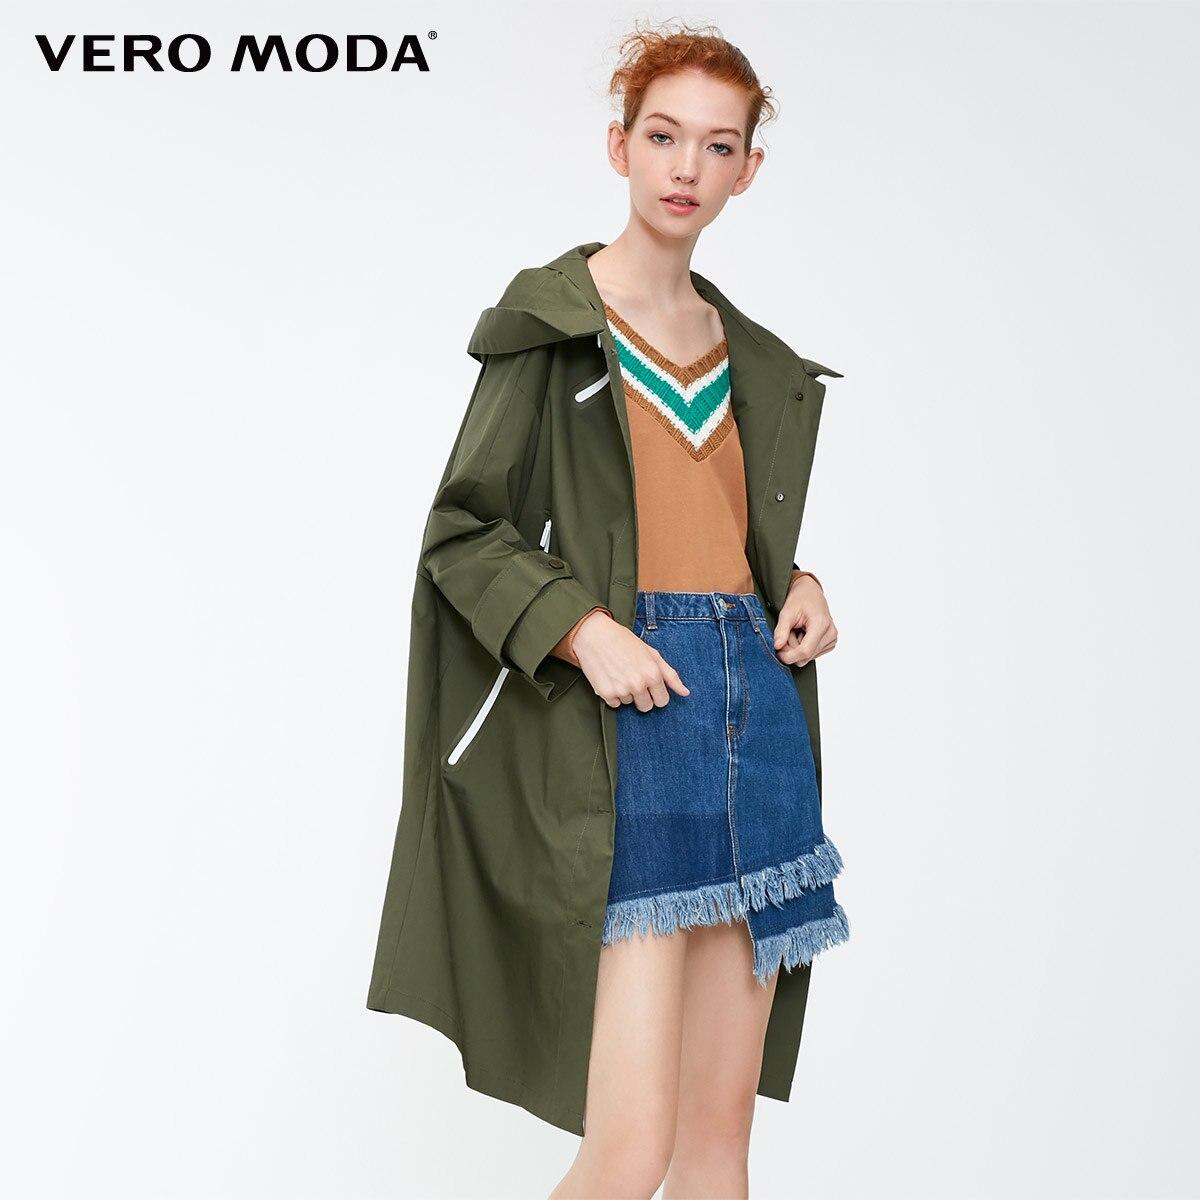 Vero Moda 2019 New Women's Sports Style Decorative Zip Hooded Wind Coat   Trench   Coat | 318421506